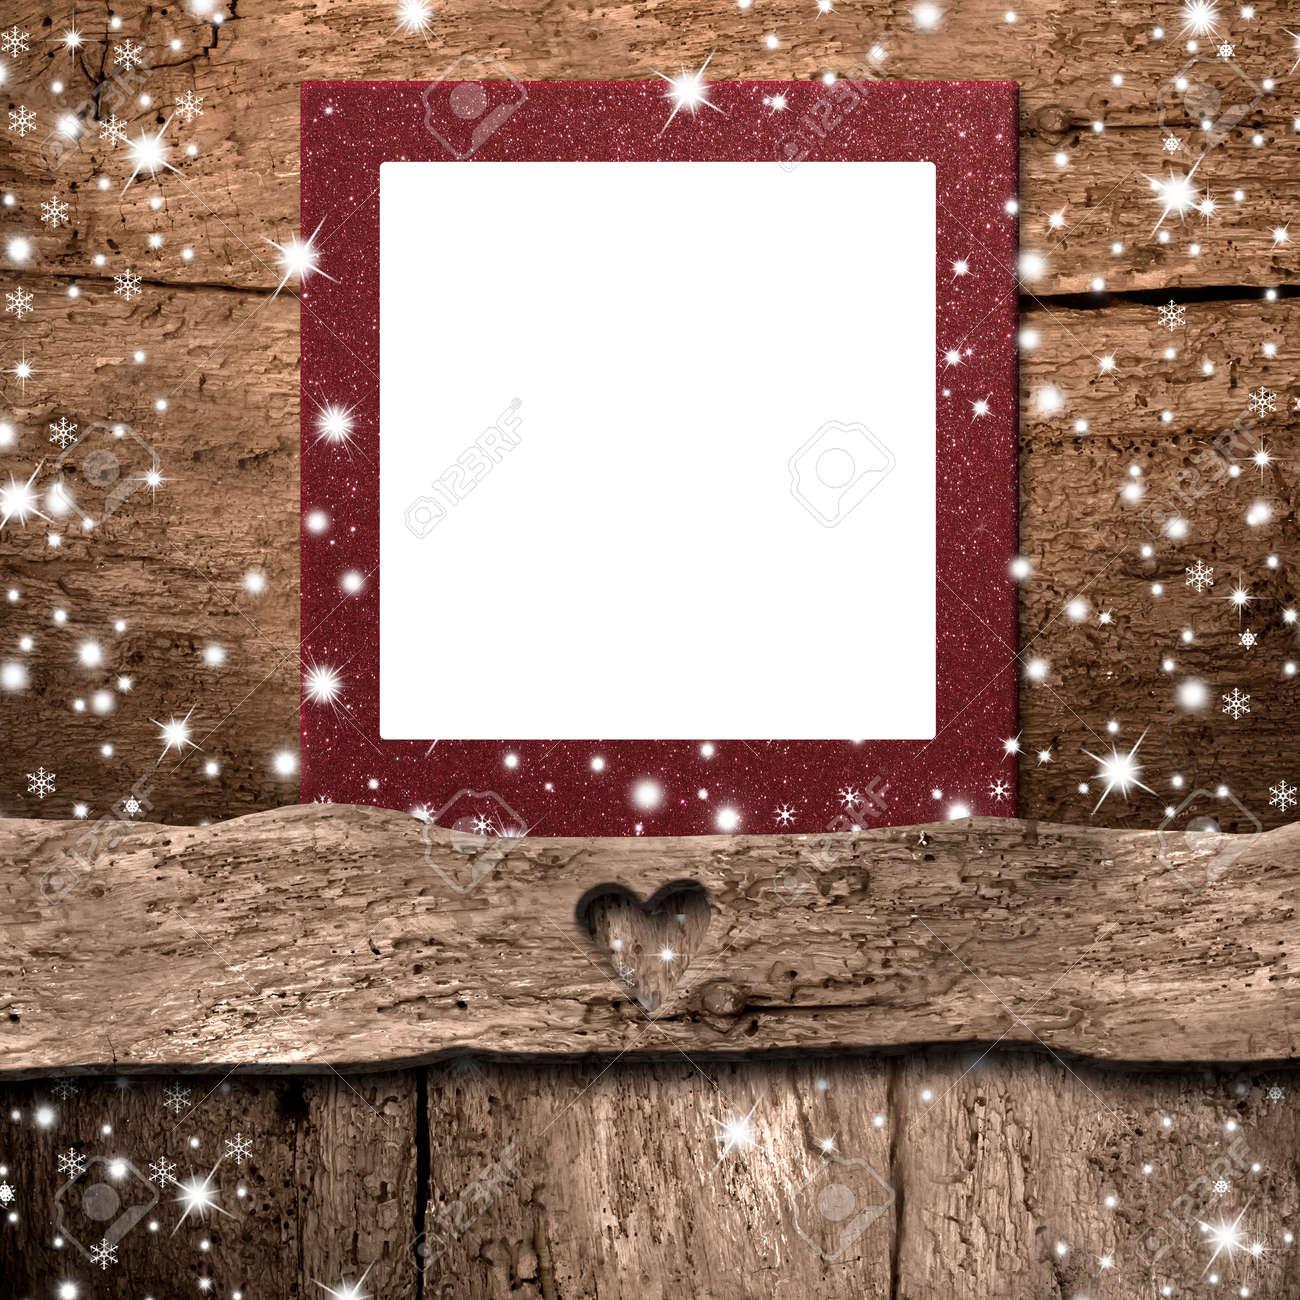 Fotorahmen Weihnachten.Stock Photo